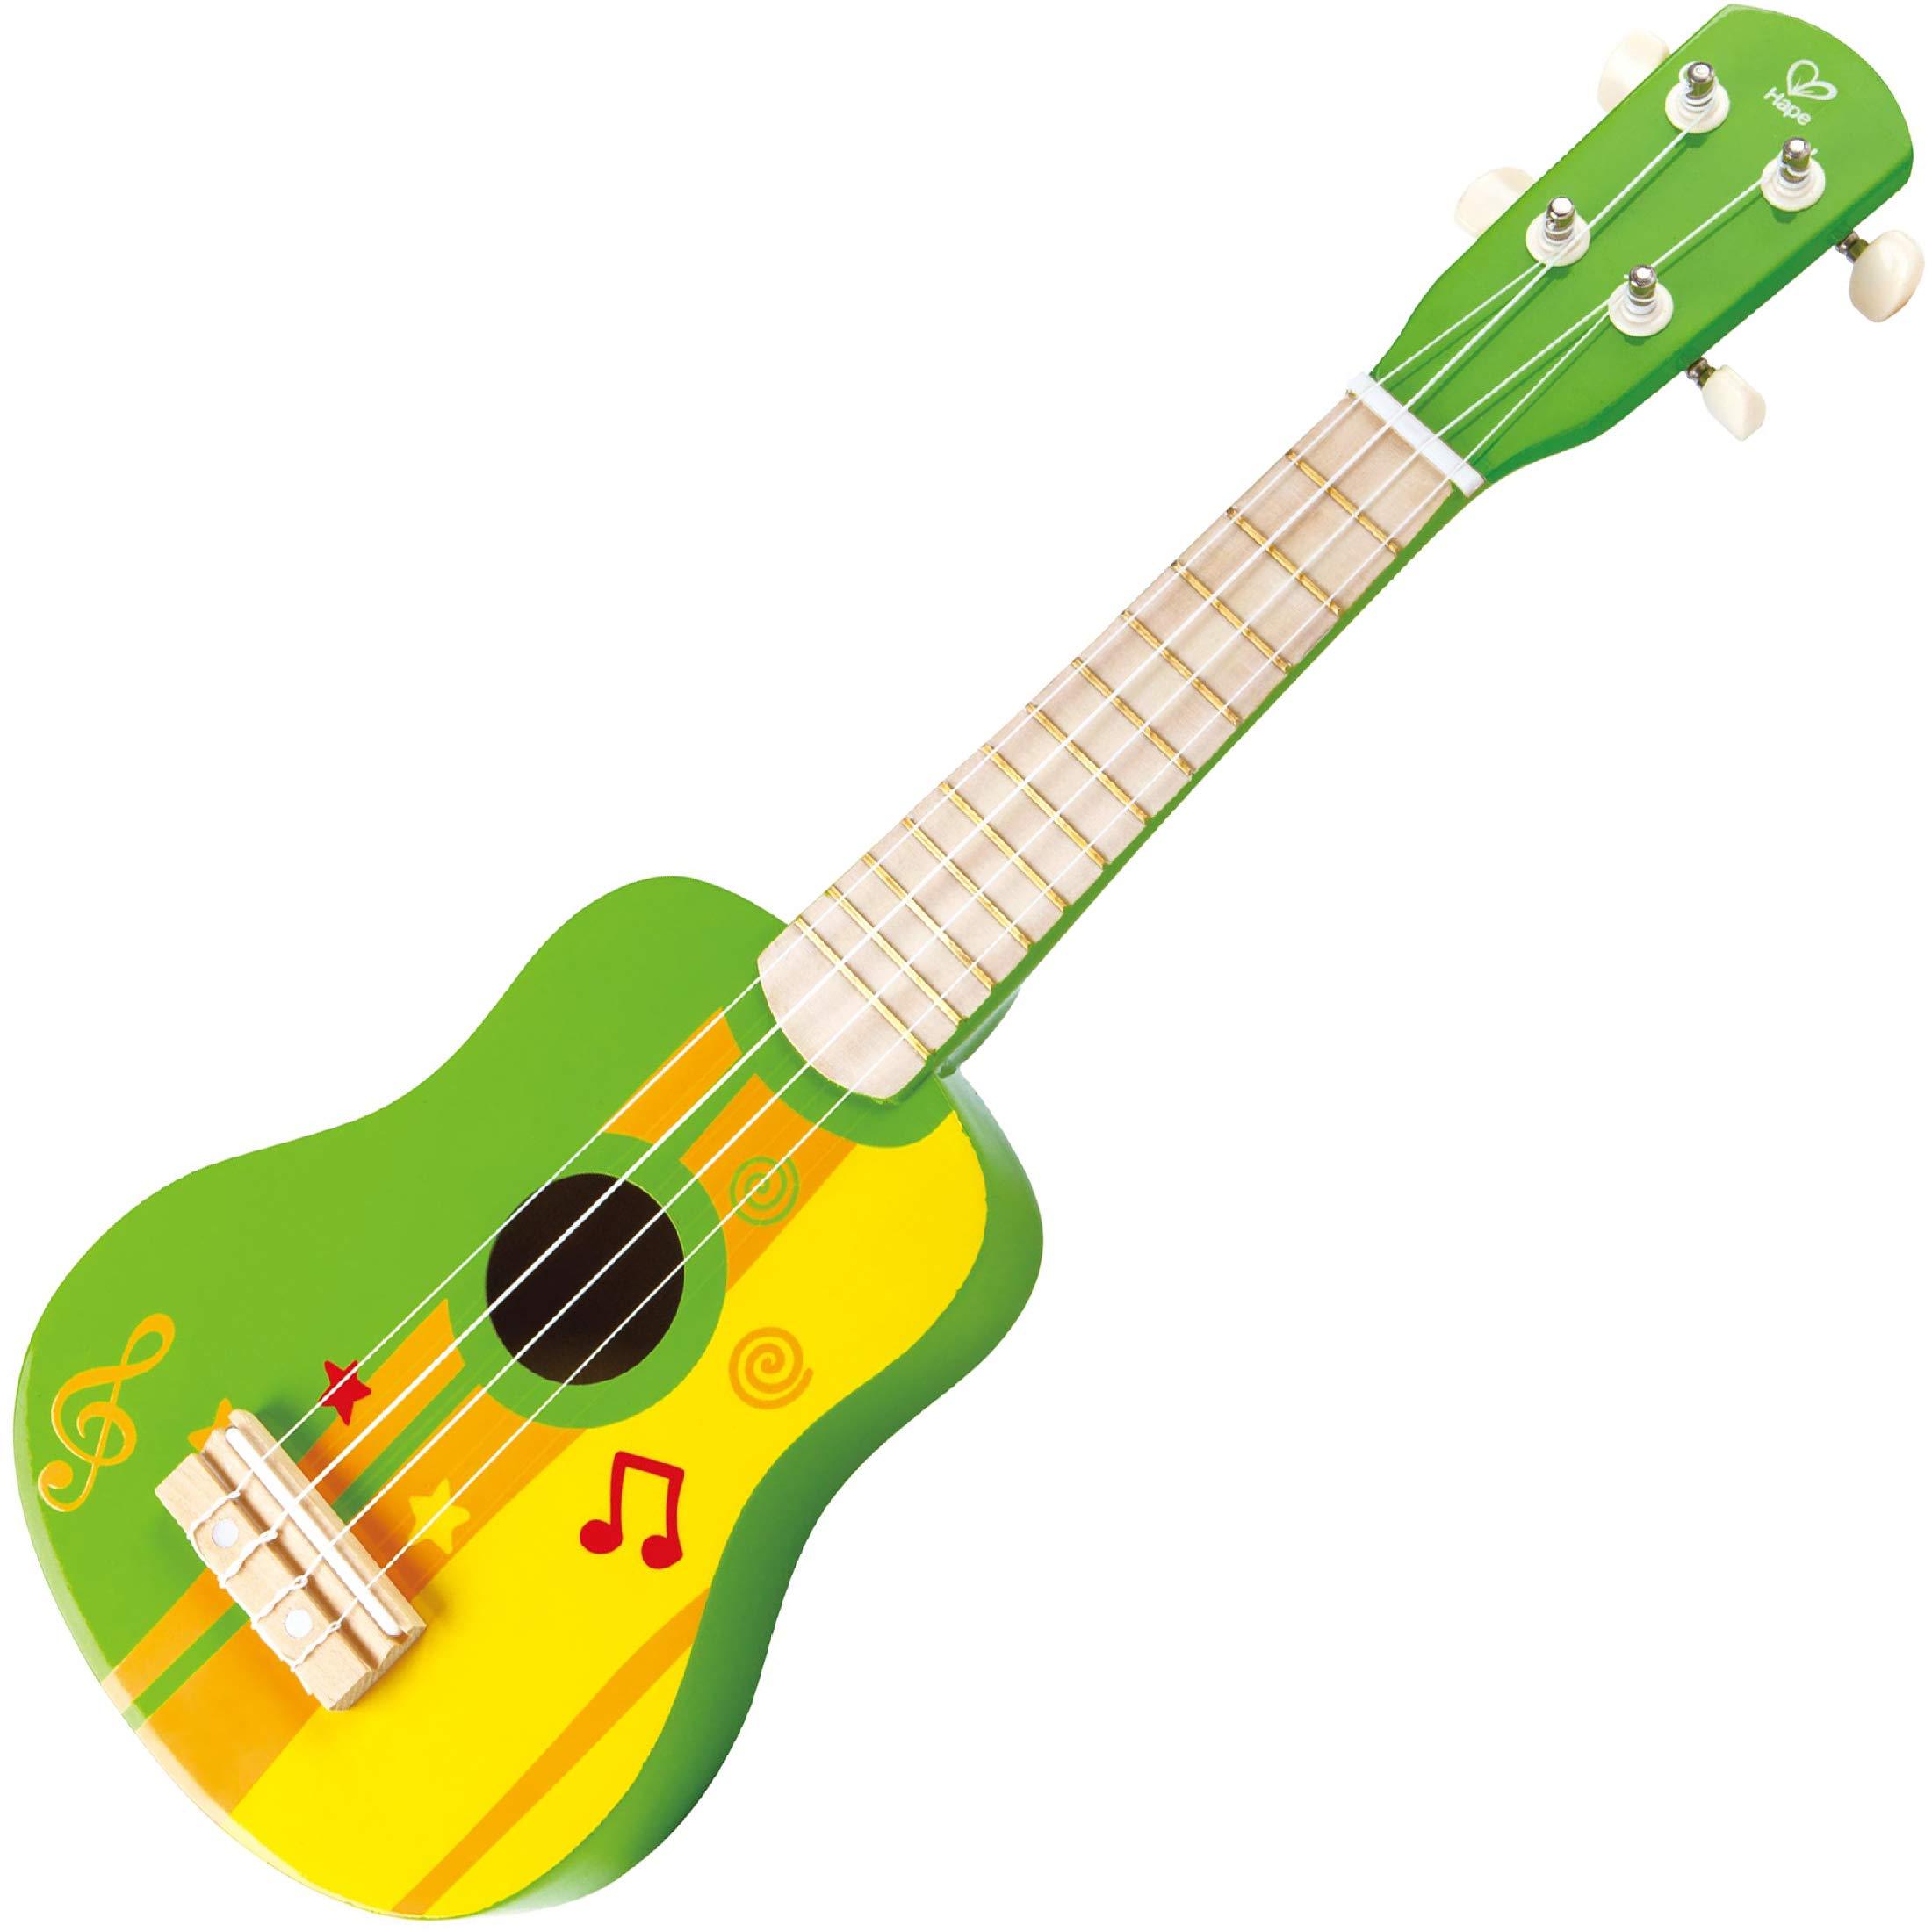 Kids Ukulele Toy Guitar for Toddlers - Hape Wooden Ukulele Kids Guitar for Girls or Boys; Starter Acoustic Hawaiian Ukulele Musical Instrument (Green) by Hape